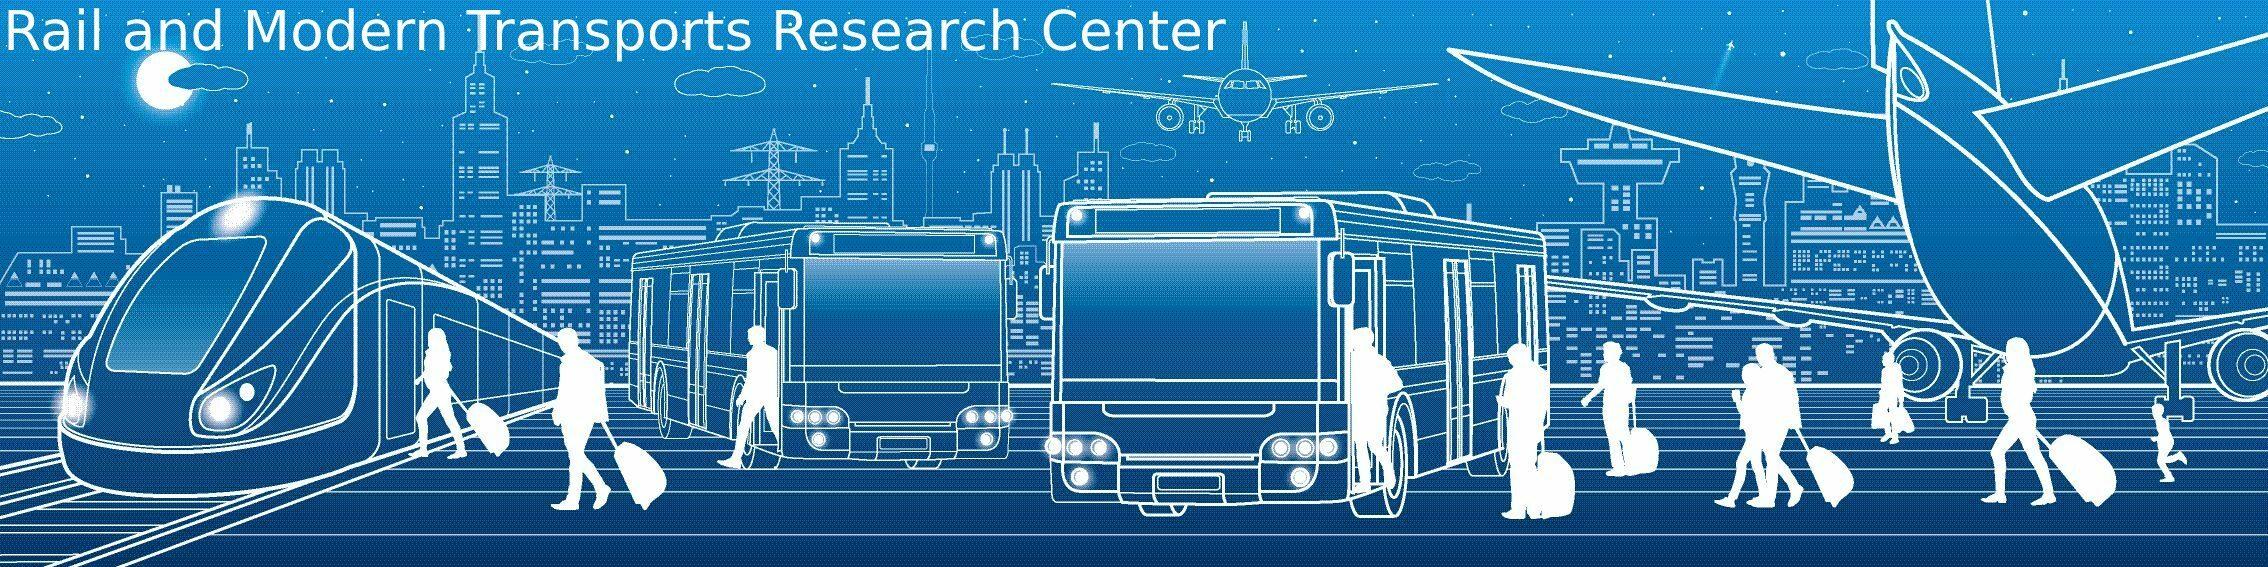 Rail and Modern Transports Research Center (RMT) : ศูนย์วิจัยเทคโนโลยีระบบรางและการขนส่งสมัยใหม่ สวทช.